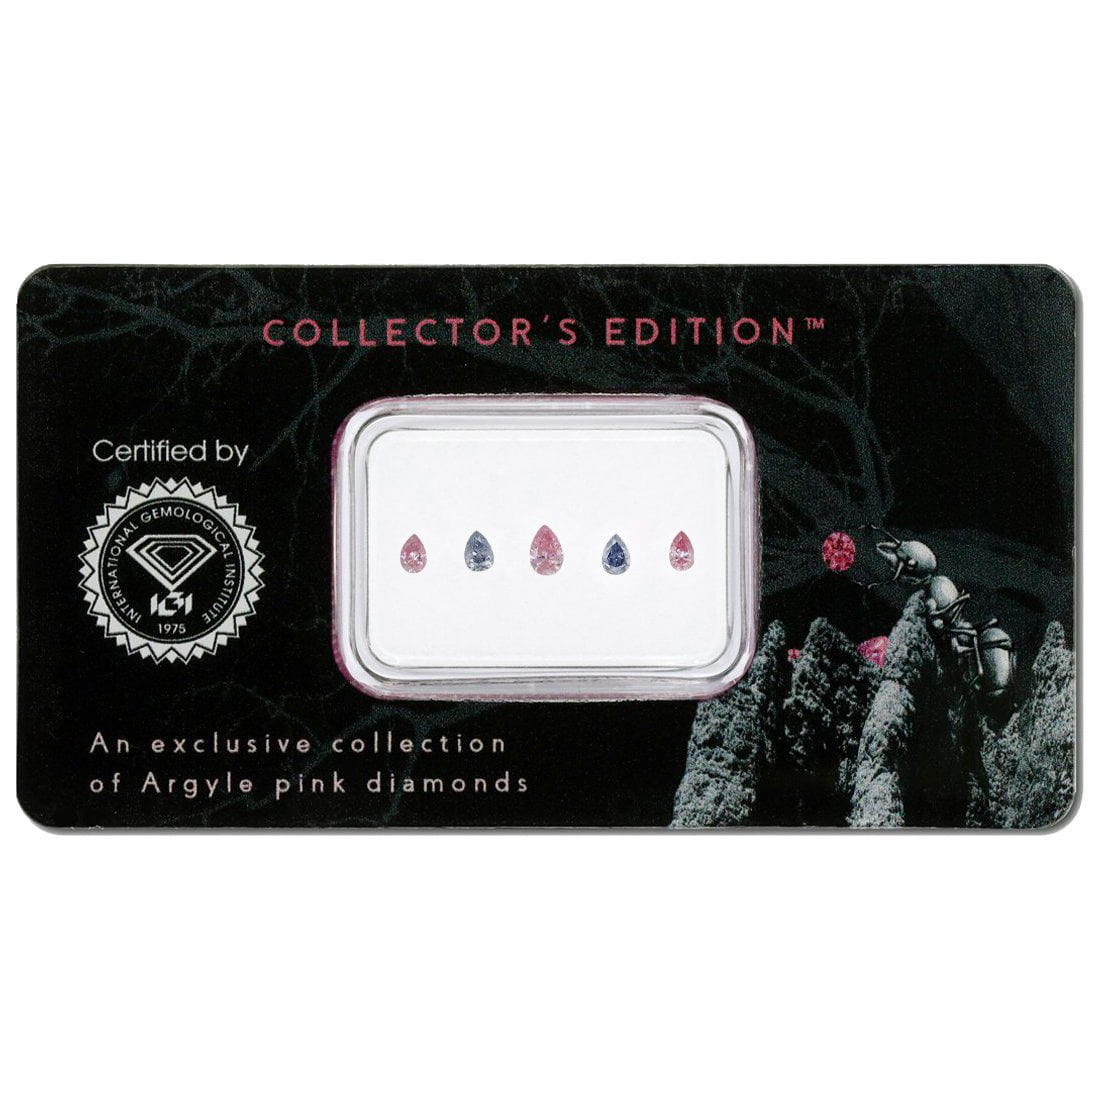 5=0.28ct Natural Fancy Intense Pink / Intense Grey Violet, BL3 / 5PP, SI2, Argyle Pink Diamond